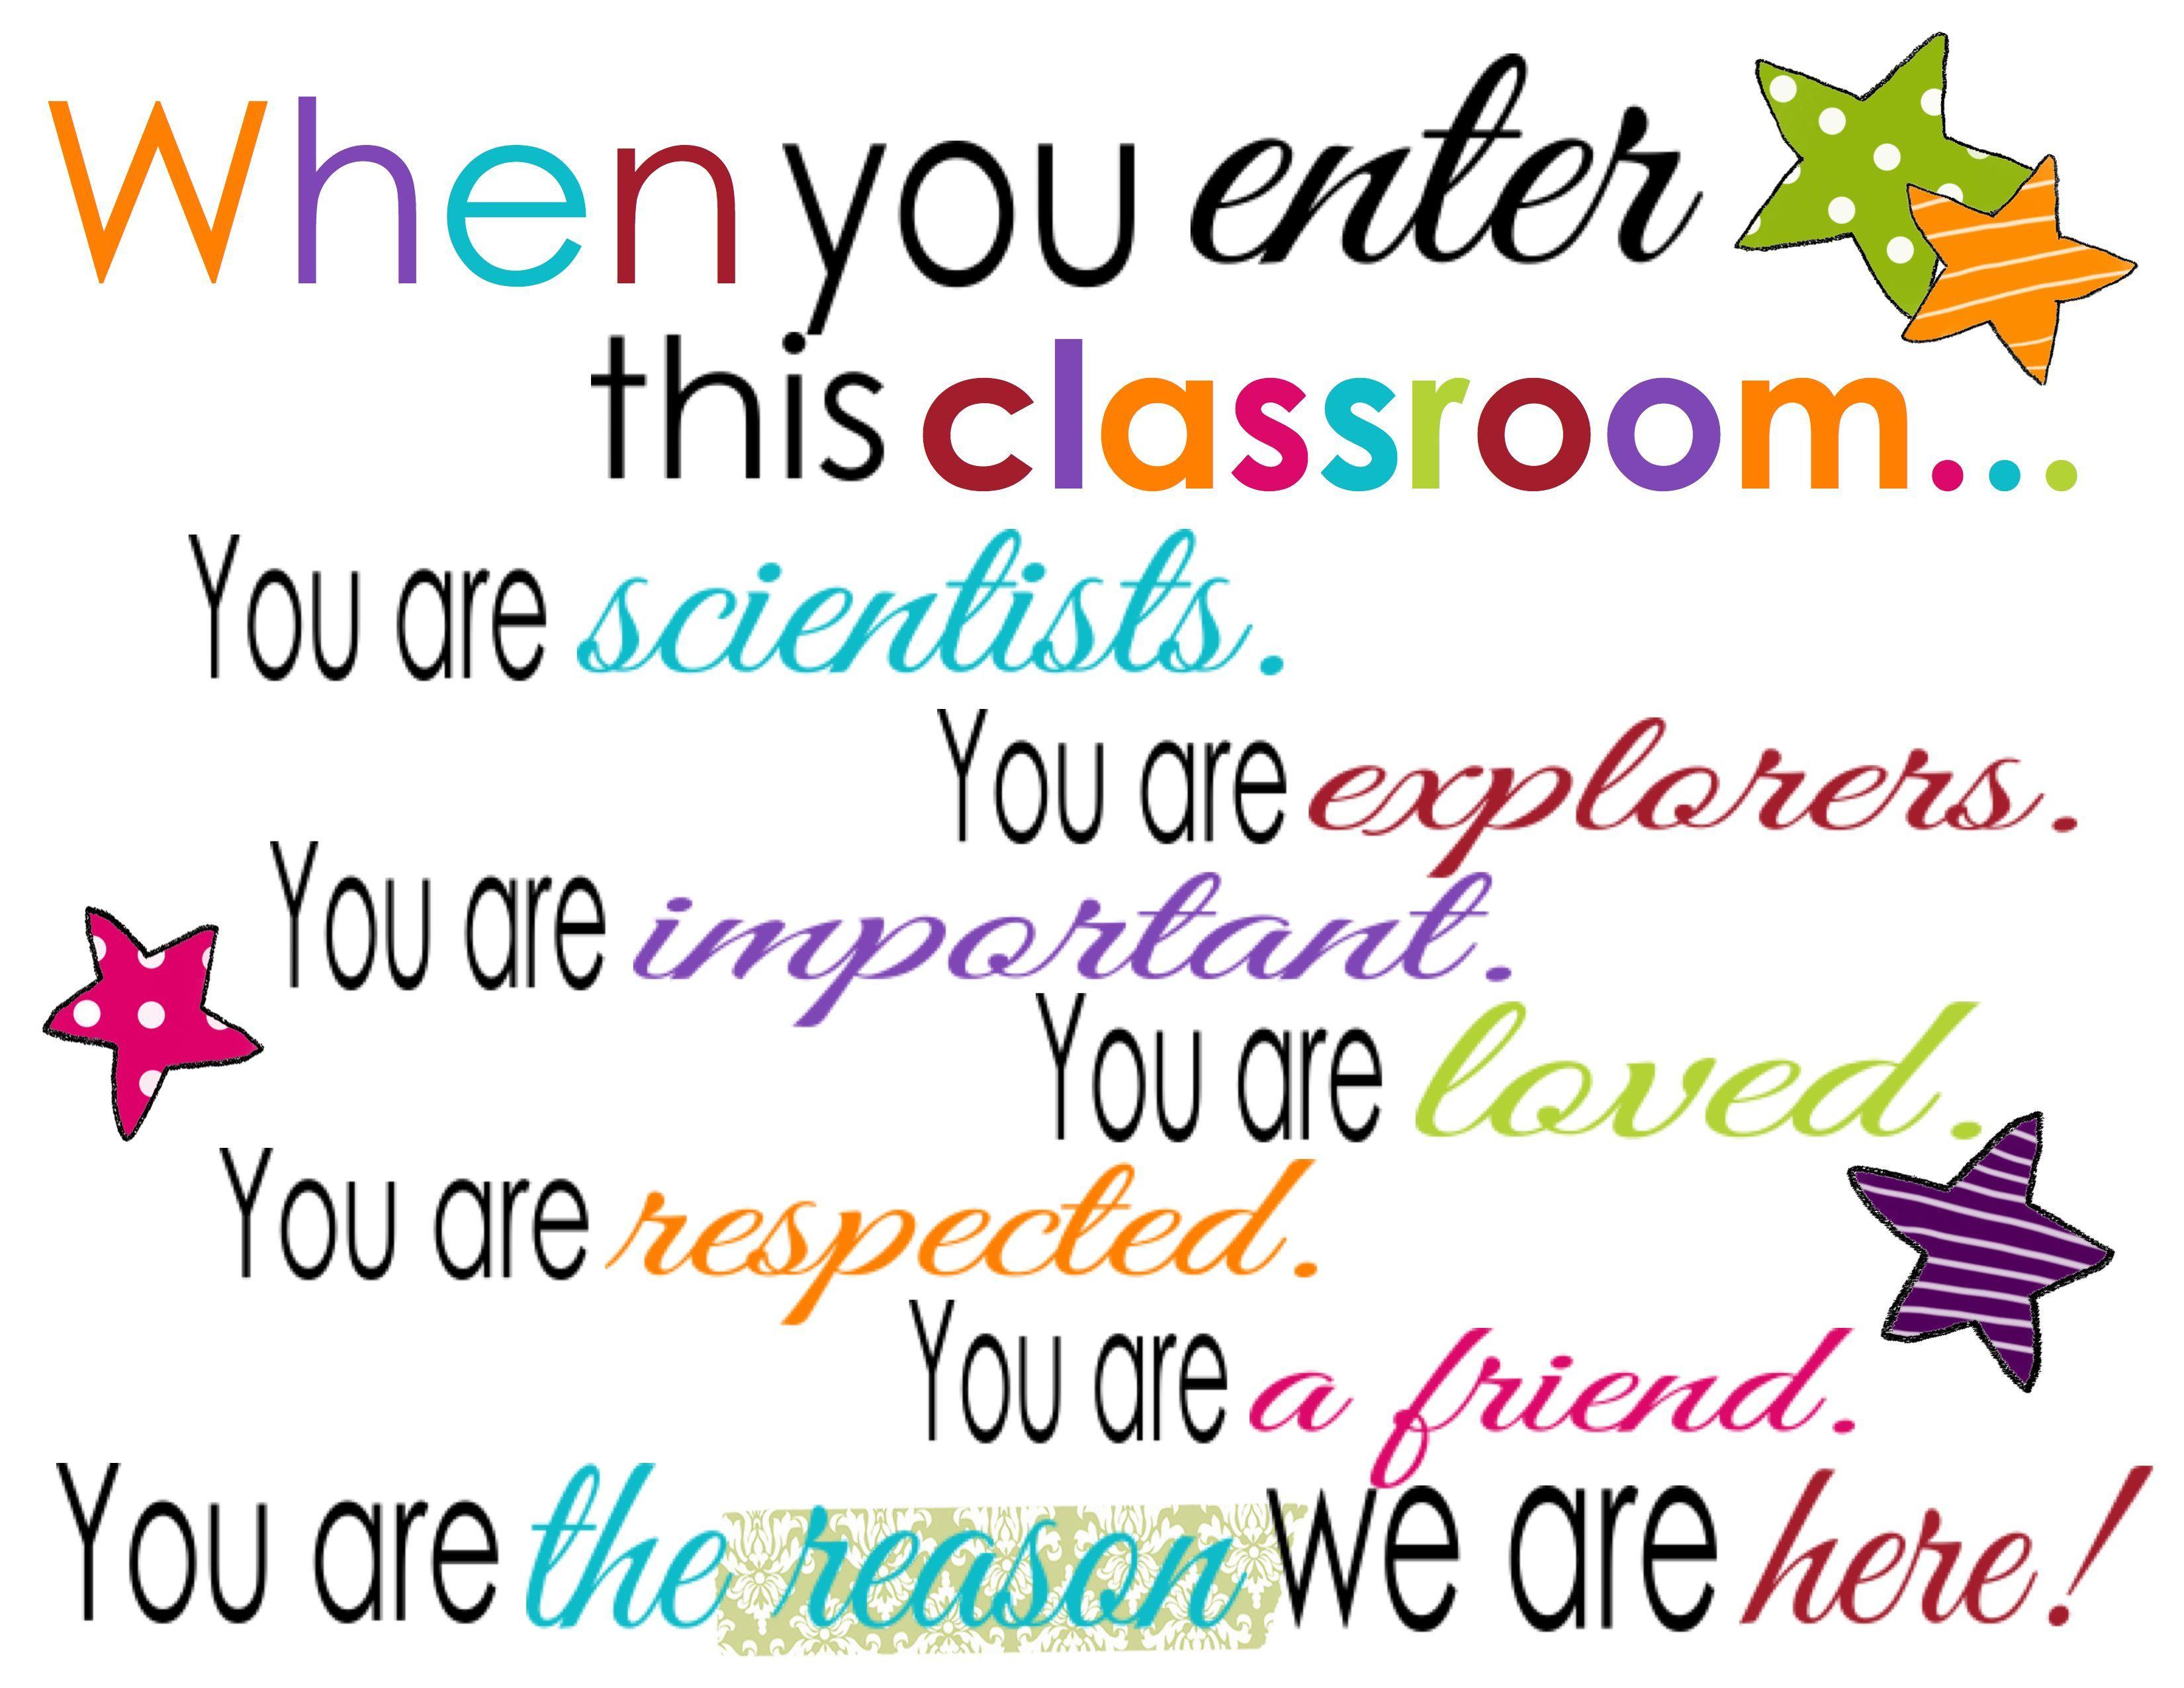 Preschool Teacher Quotes Preschool Teacher Quotes Classy Best 25 Preschool Teacher Quotes